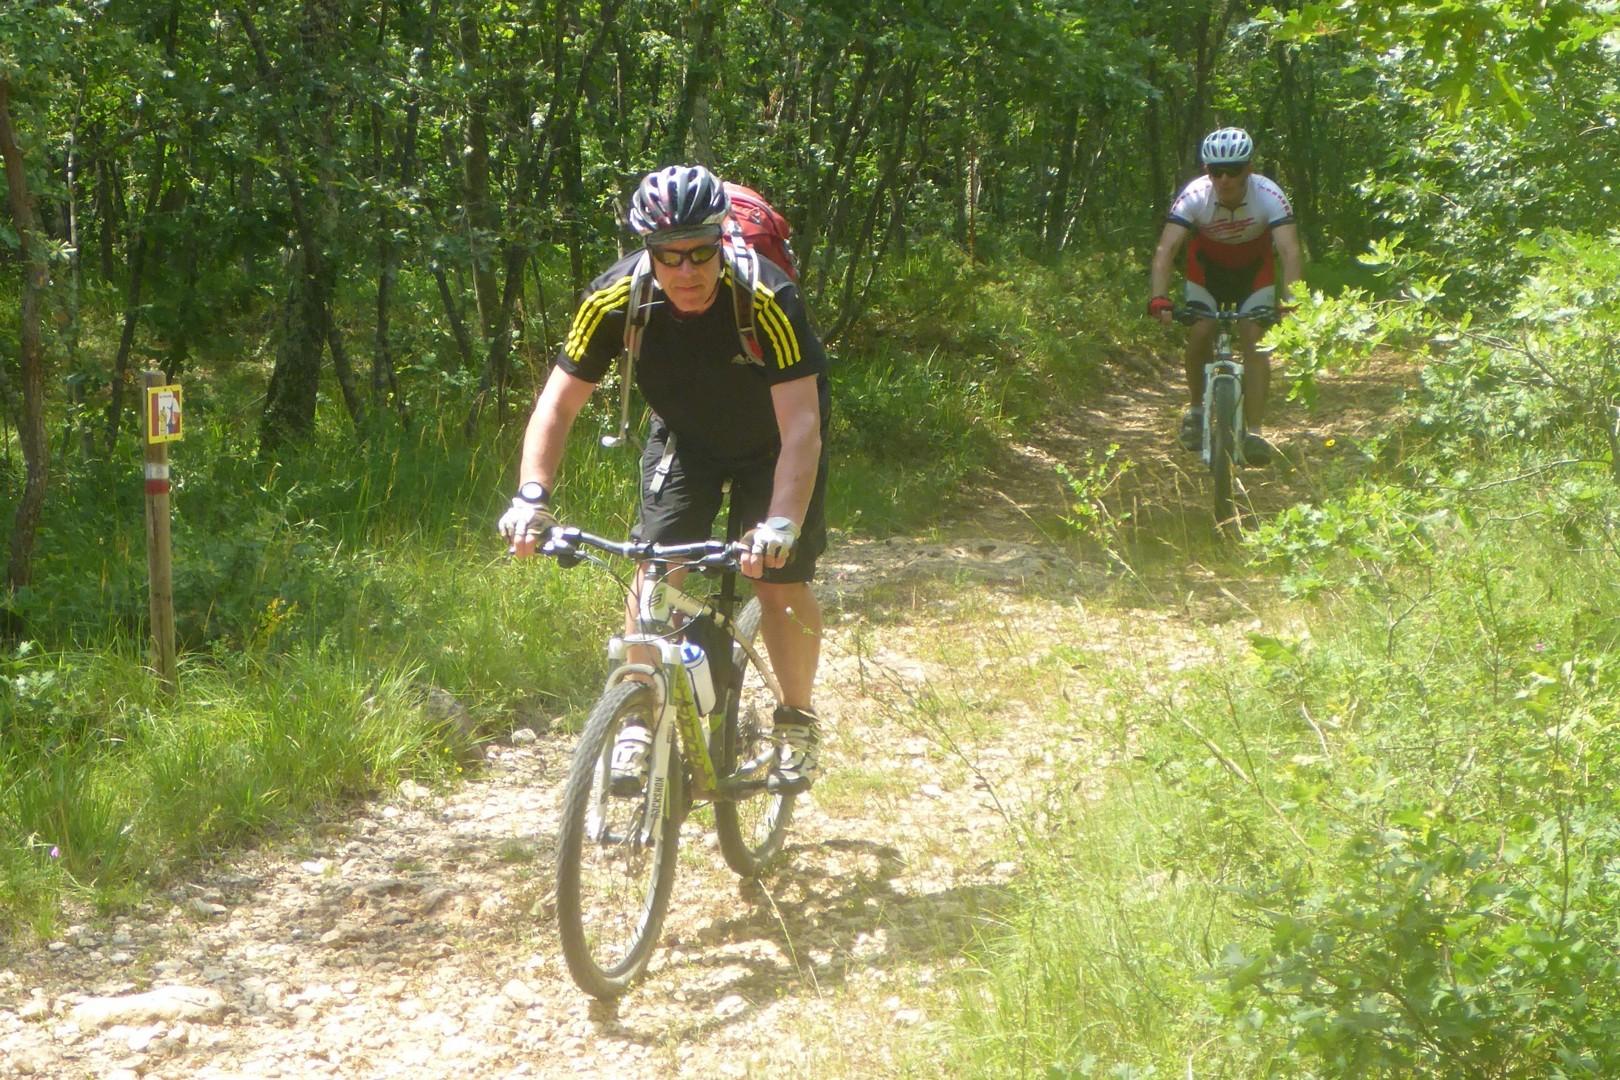 _Holiday_658_9365.jpg - Italy - Tuscany - Sacred Routes  - Self Guided Mountain Bike Holiday - Mountain Biking